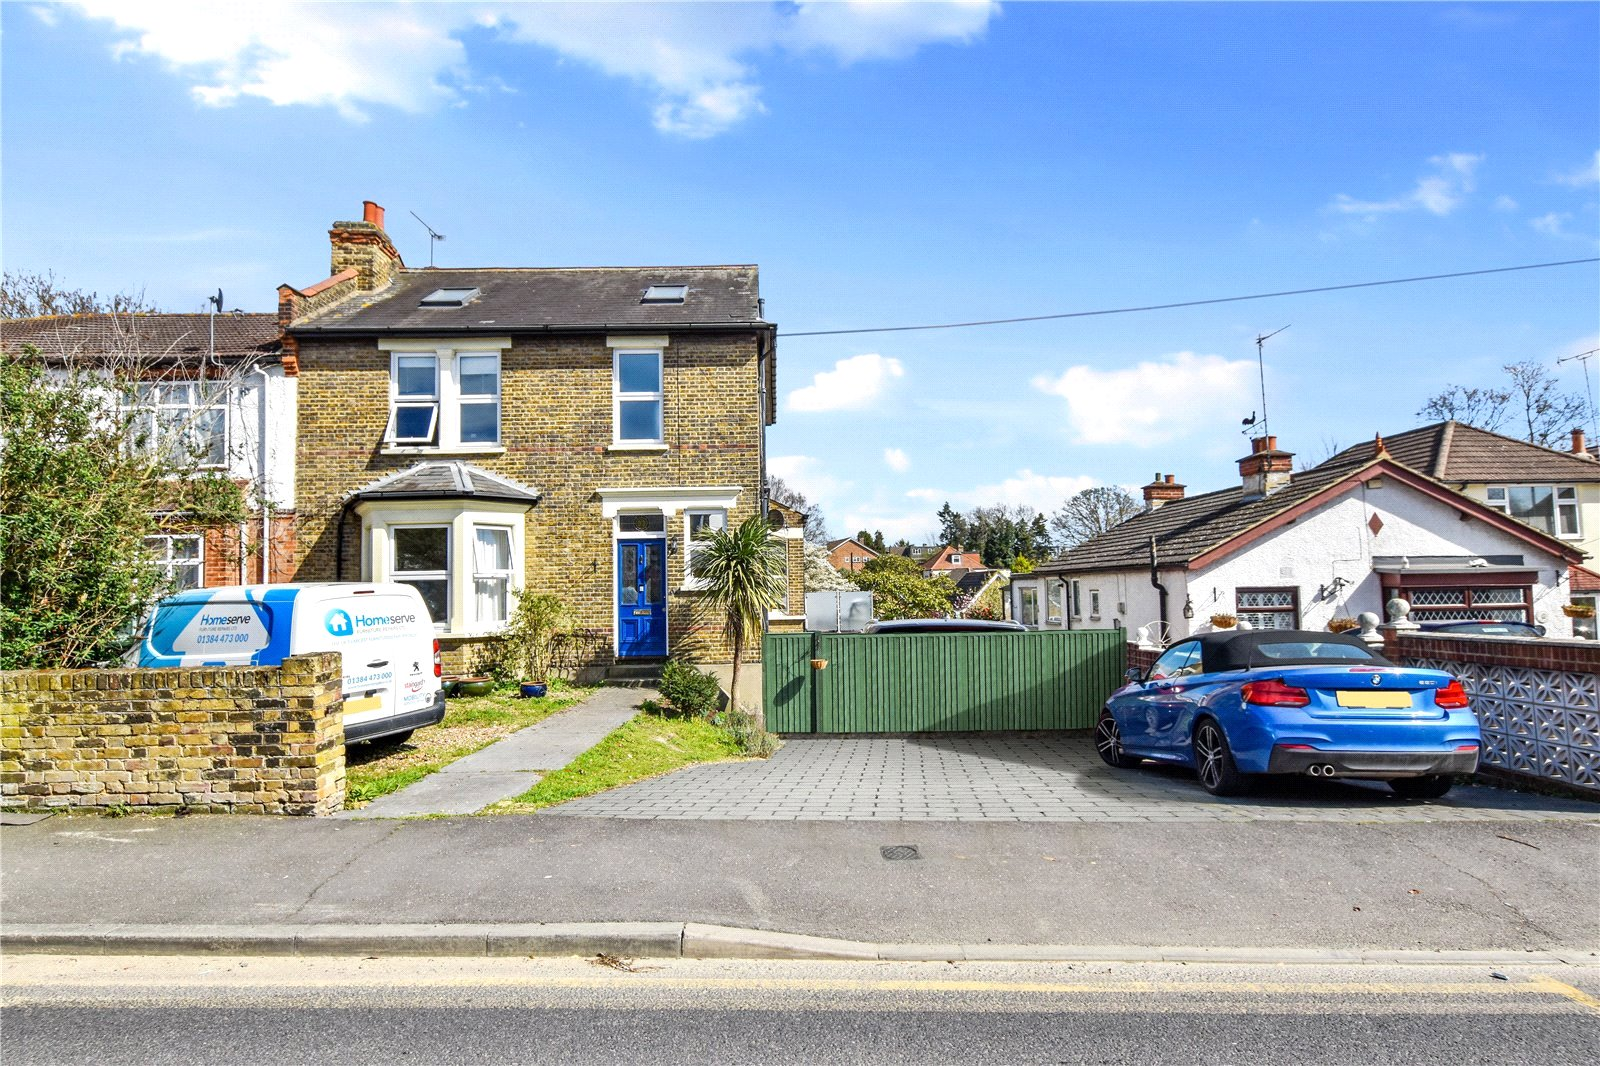 Upton Road, Bexleyheath, Kent, DA6